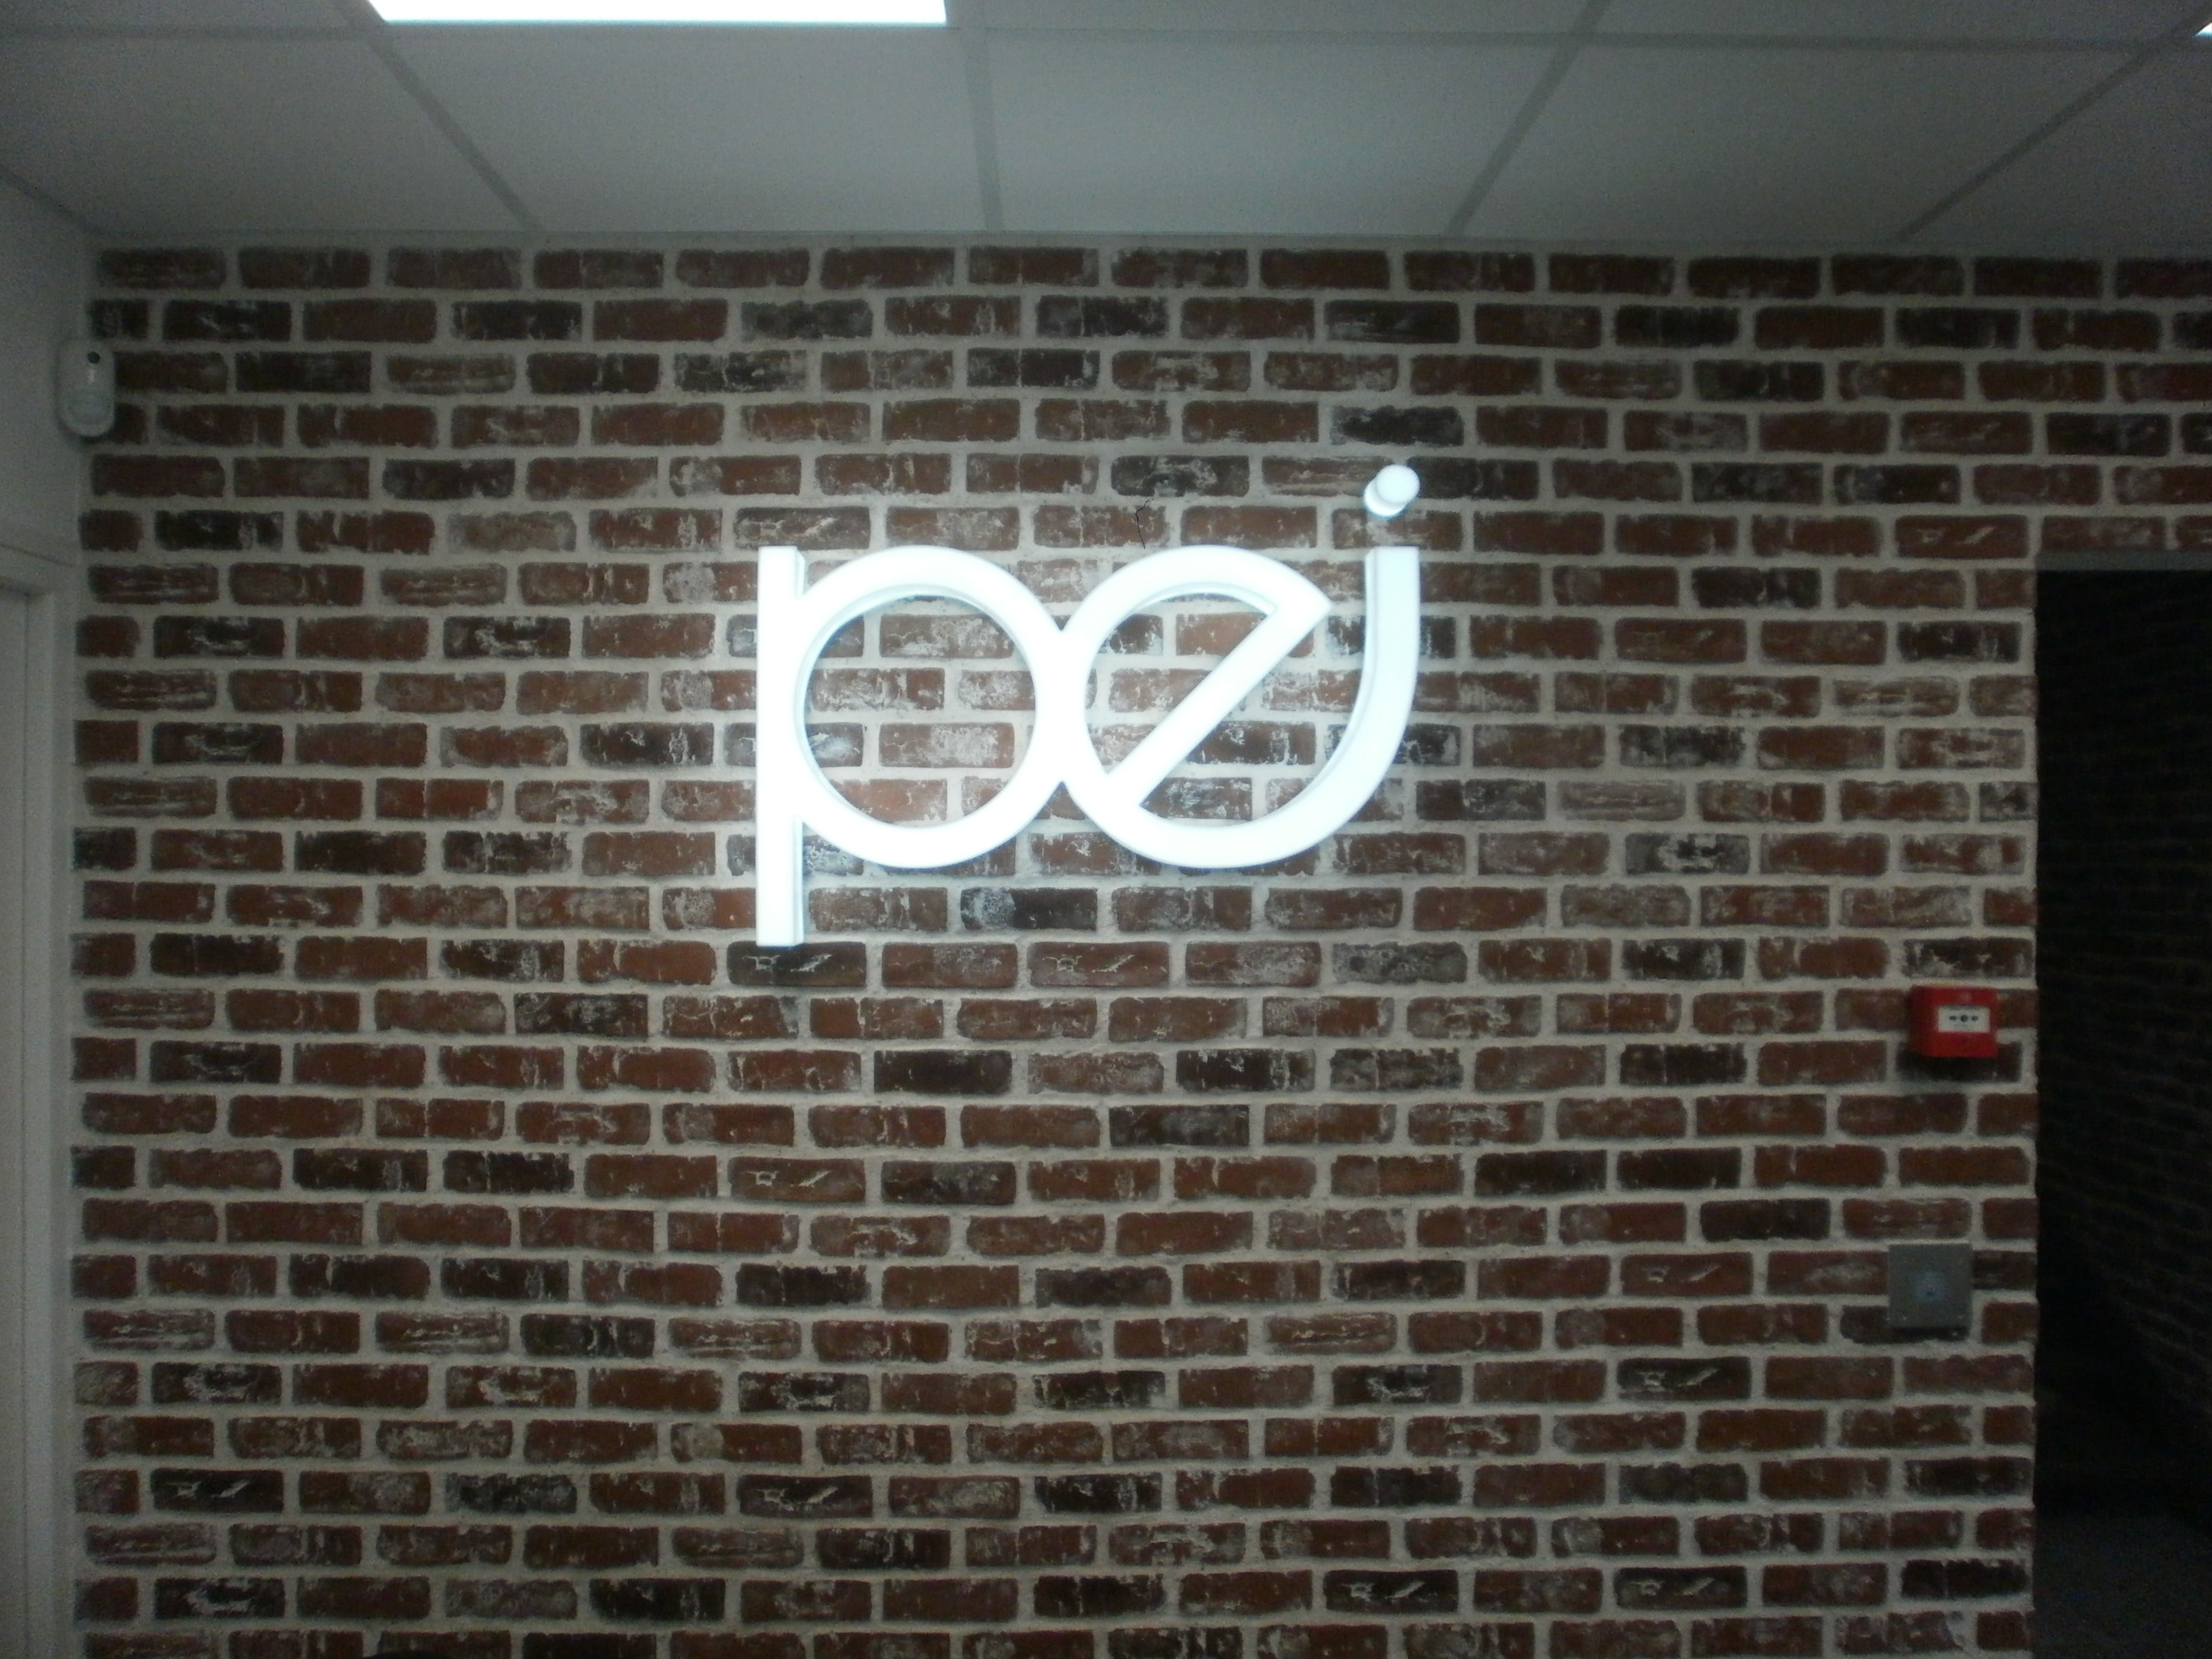 Lettres Reliefs en plexis diffusant